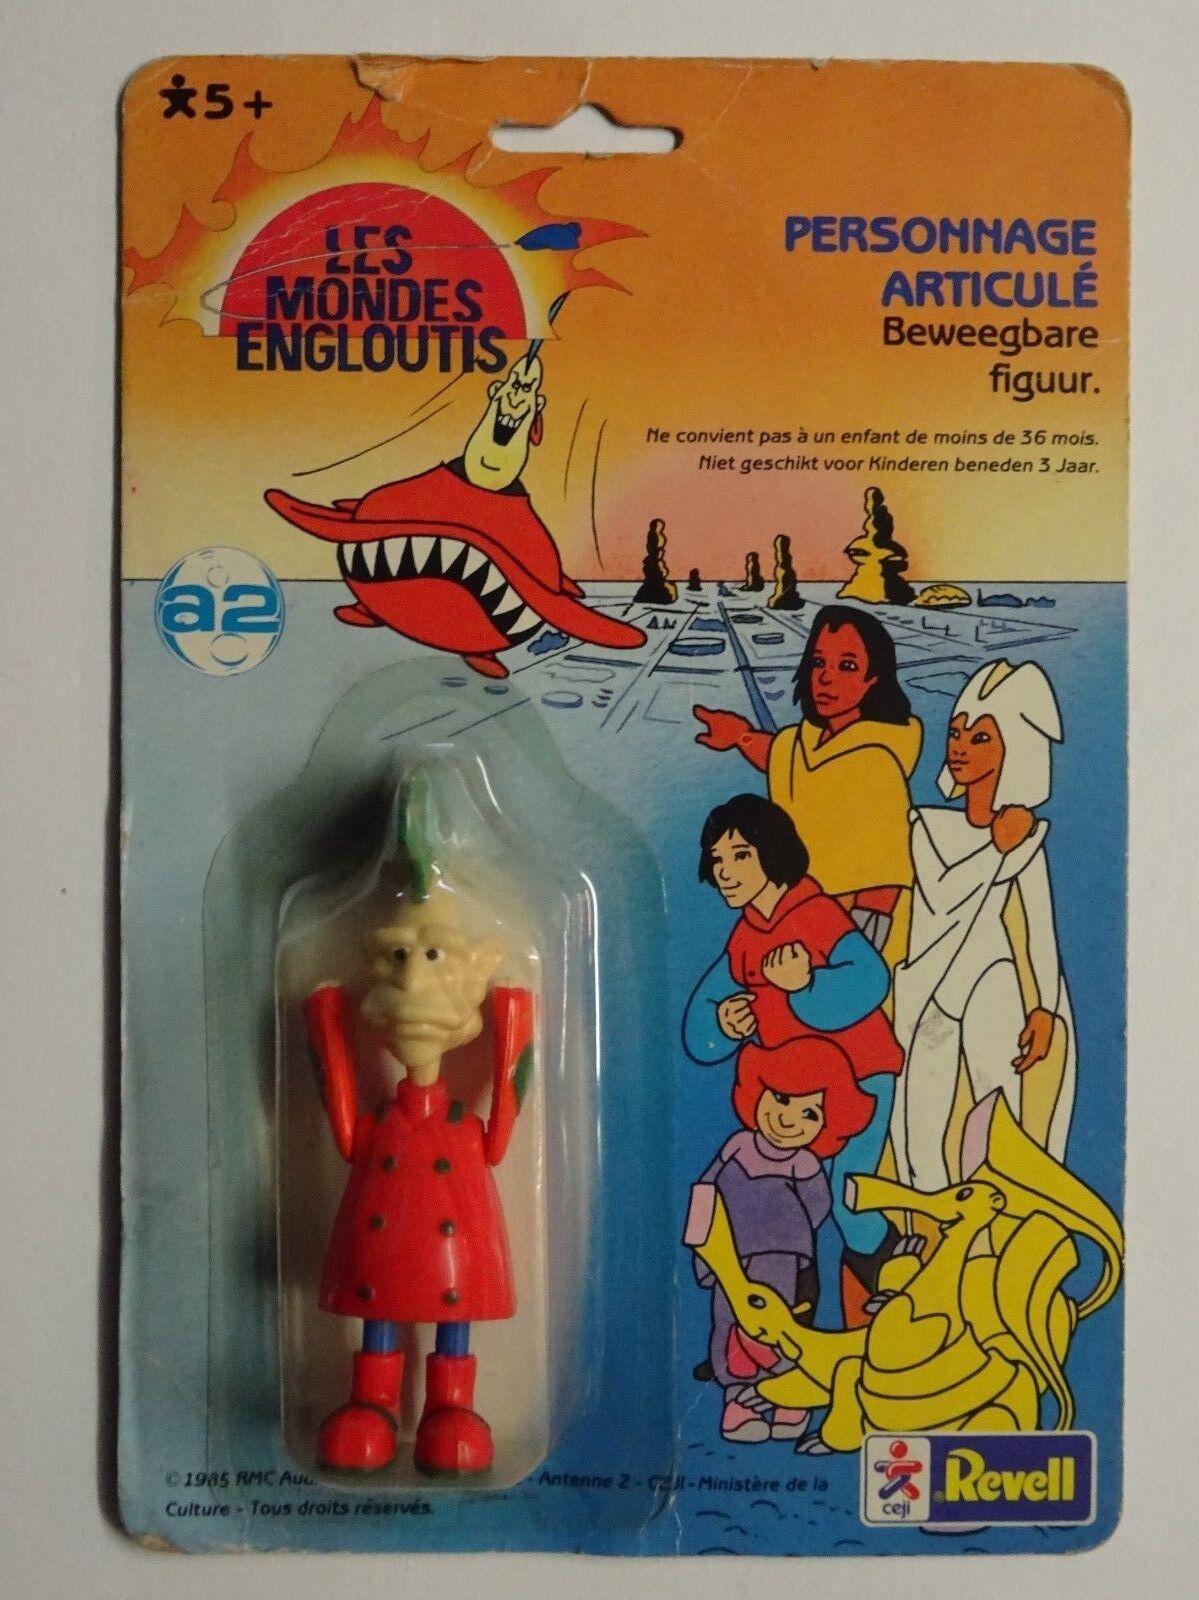 Les Mondes Engloutis - Figurine Vintage - Seskapil - Ceji / Revell 1985